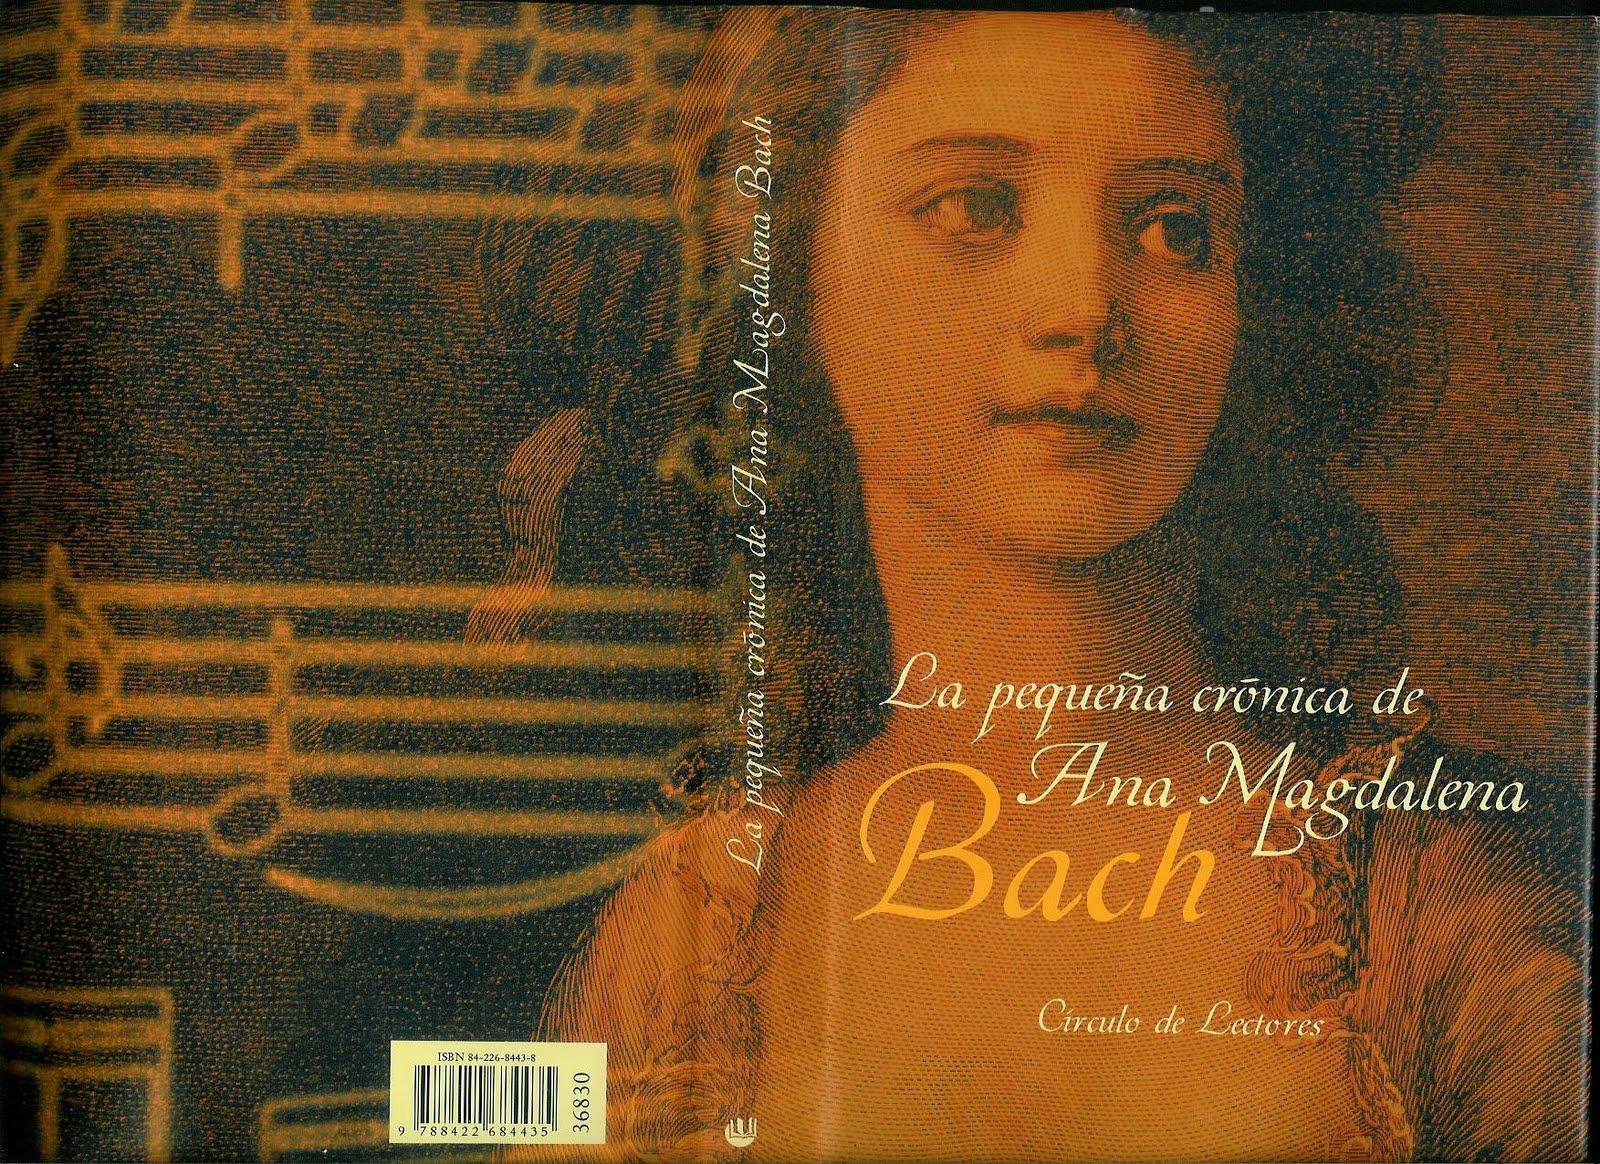 juan sebastian bach biografia y obra: